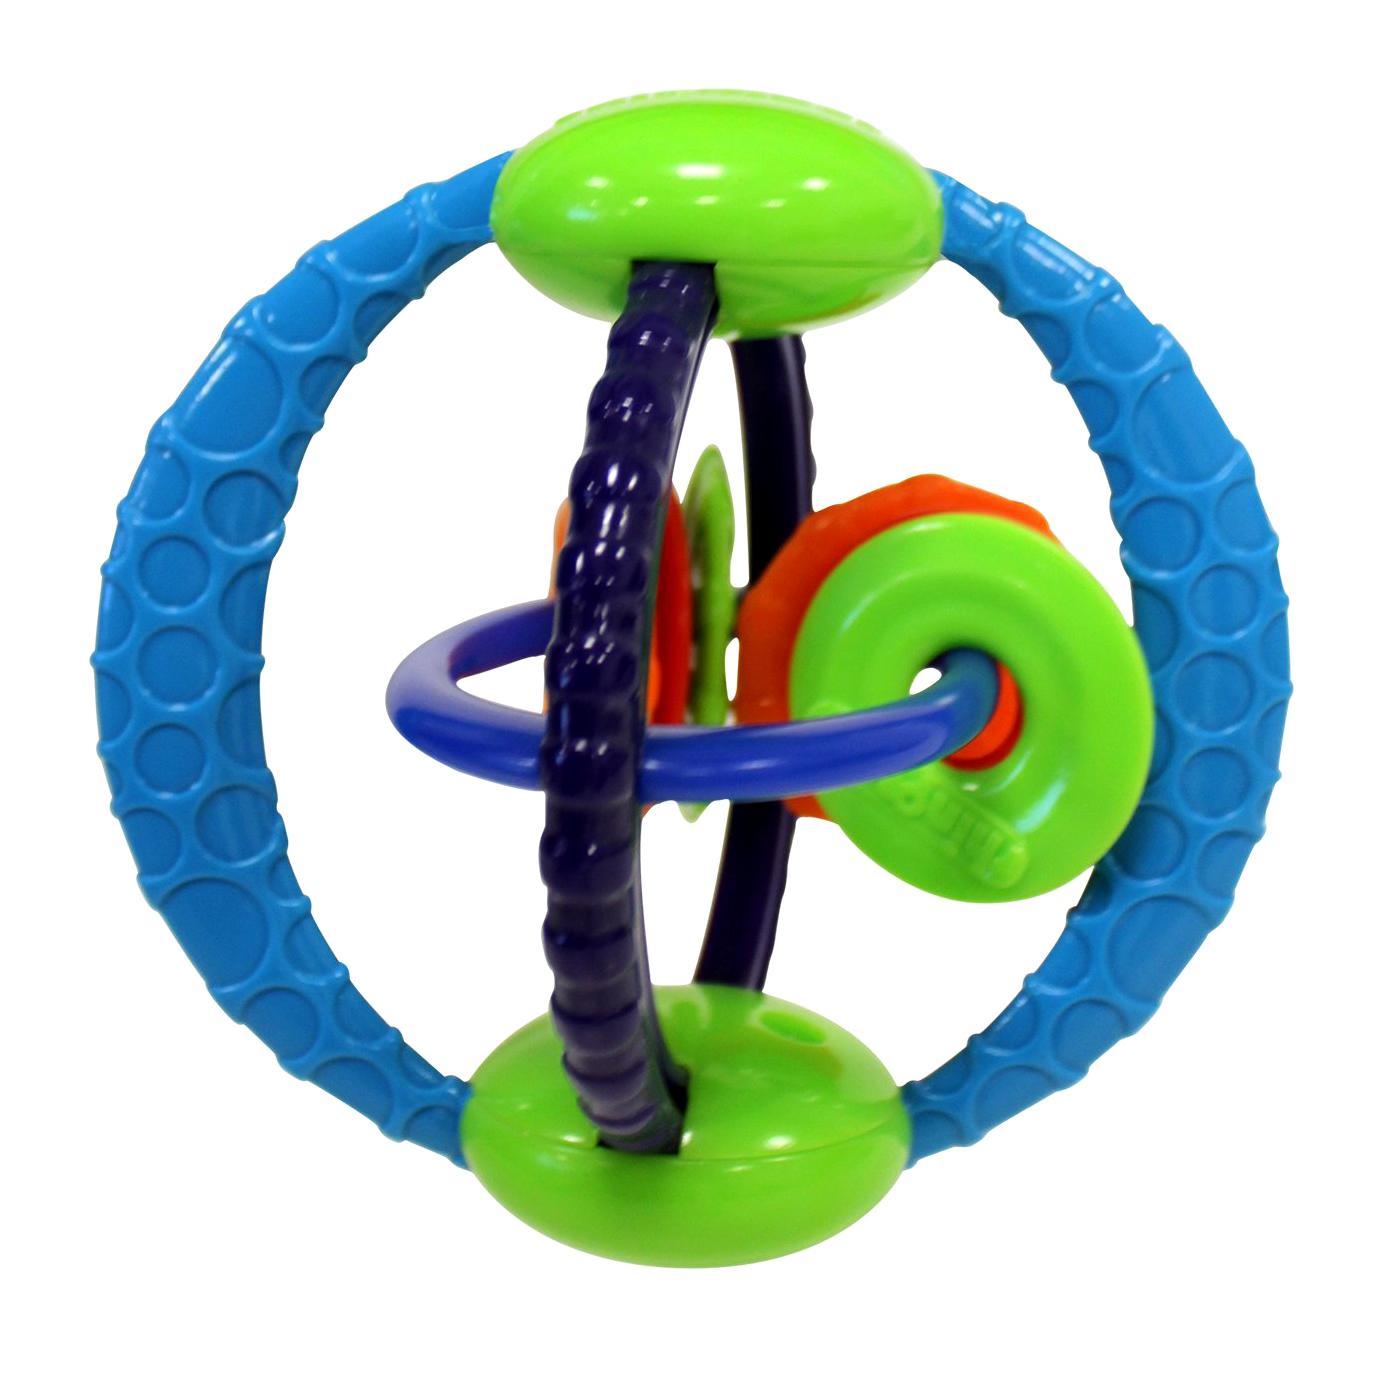 Развивающая игрушка Twist-O-RoundДетские погремушки и подвесные игрушки на кроватку<br>Развивающая игрушка Twist-O-Round<br>